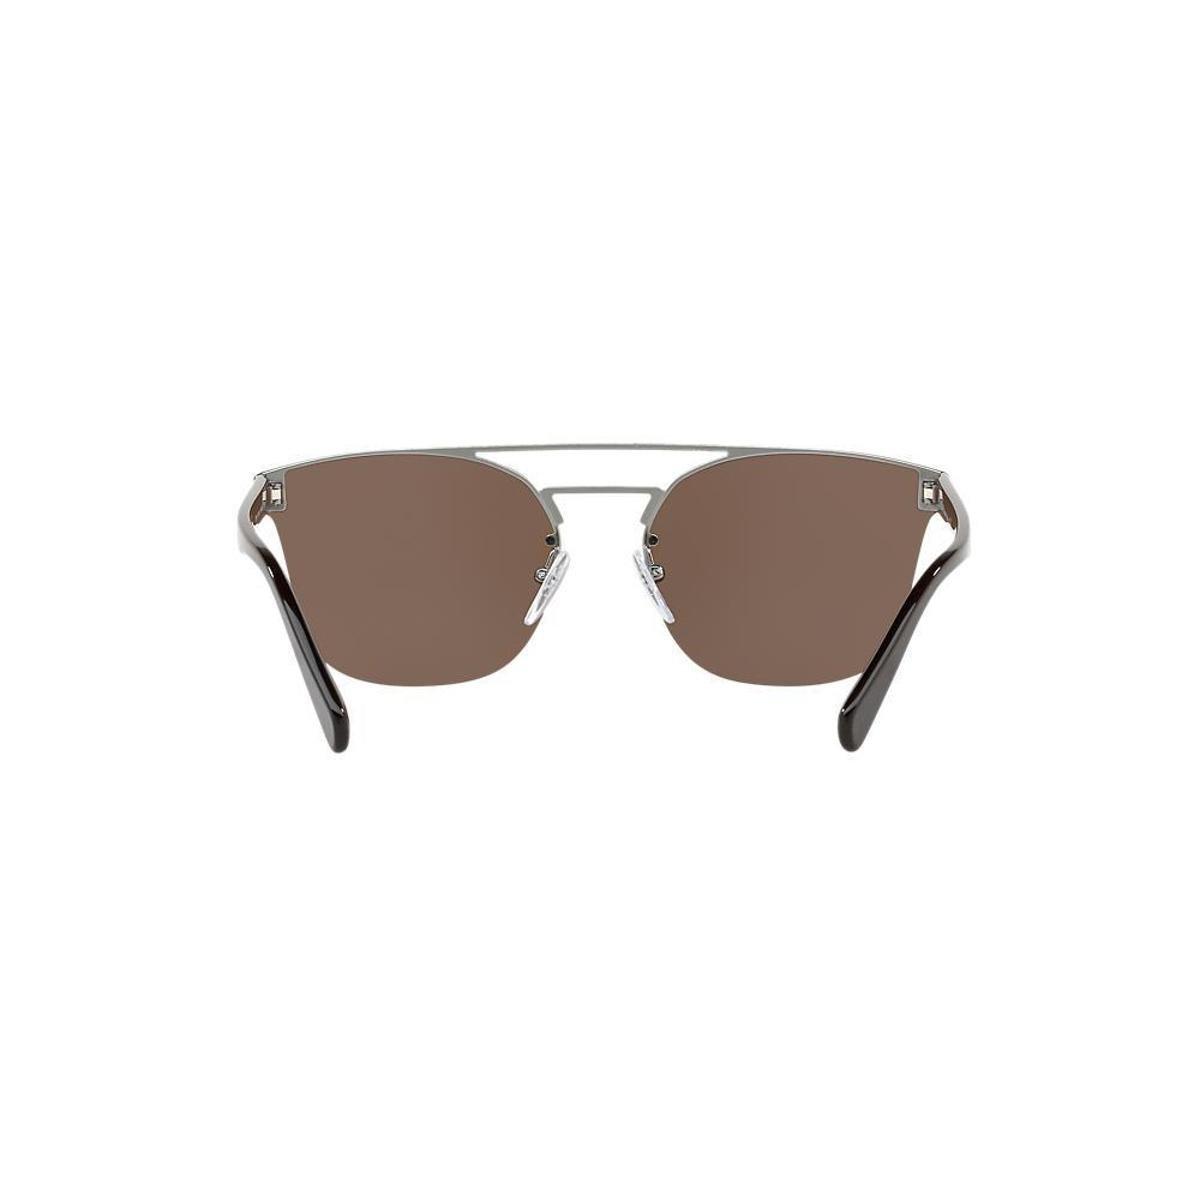 Óculos de Sol Prada Redondo PR 67TS Masculino - Compre Agora   Zattini a3cbc39e2c